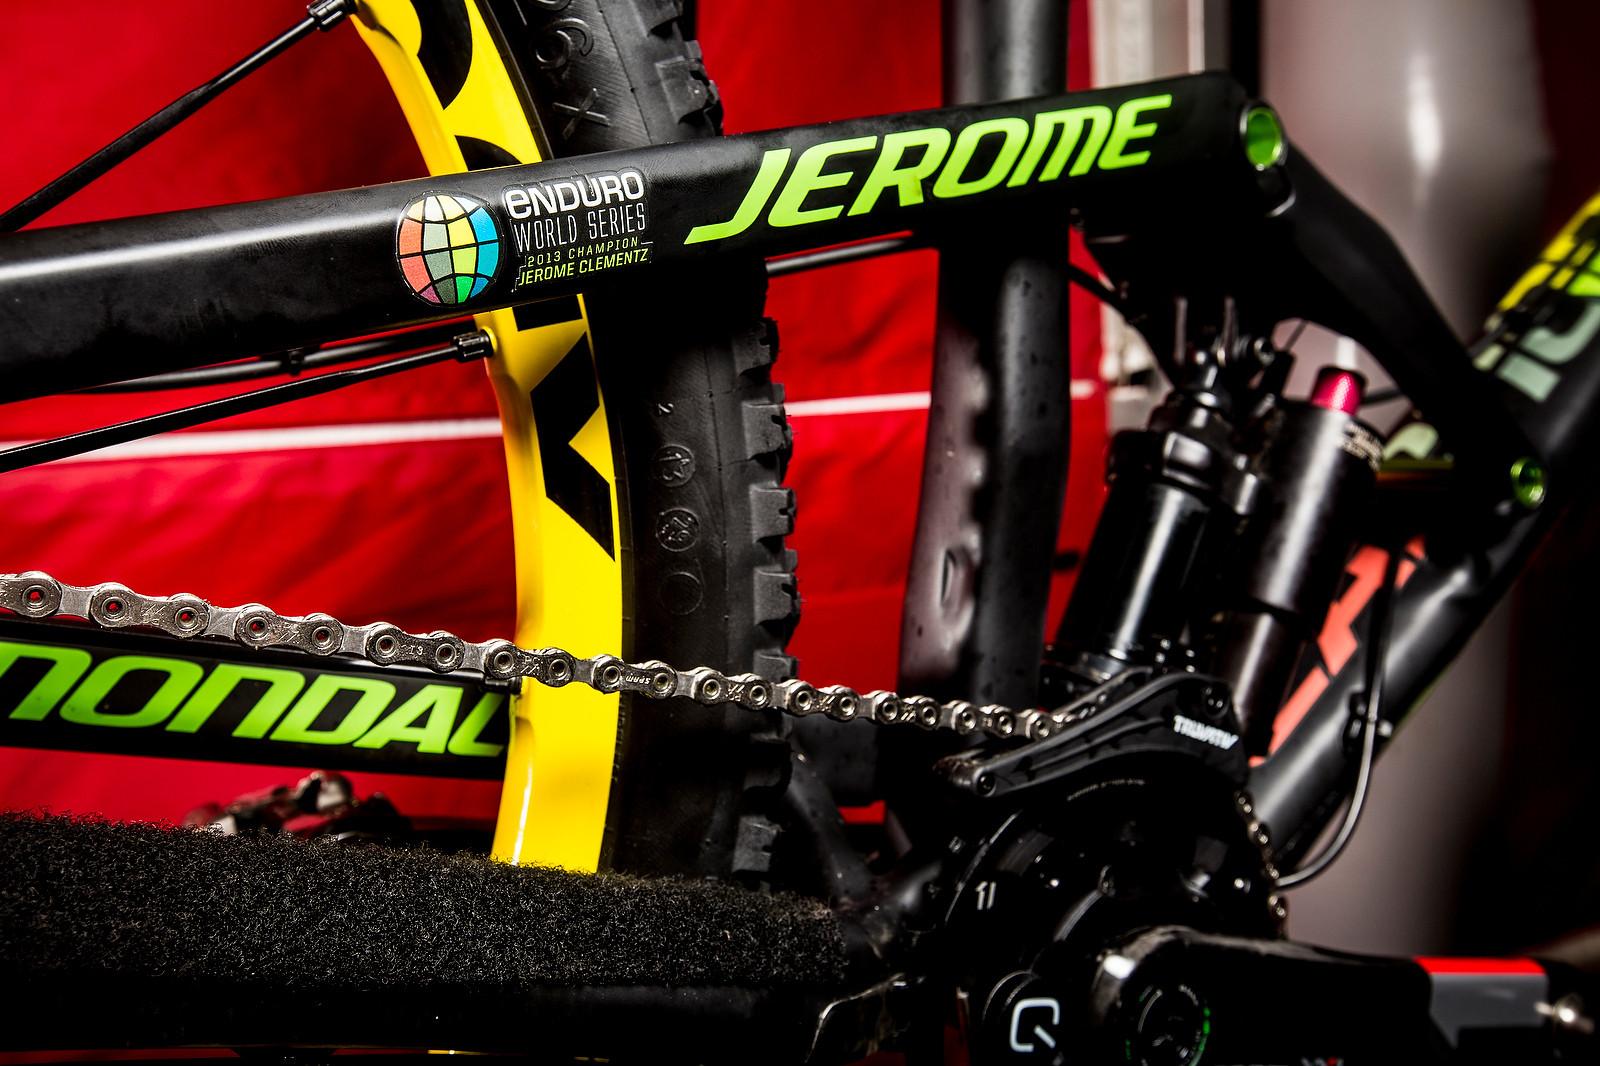 WINNING BIKE: Jerome Clementz's Cannondale Jekyll - WINNING BIKE: Jerome Clementz's Cannondale Jekyll - Mountain Biking Pictures - Vital MTB